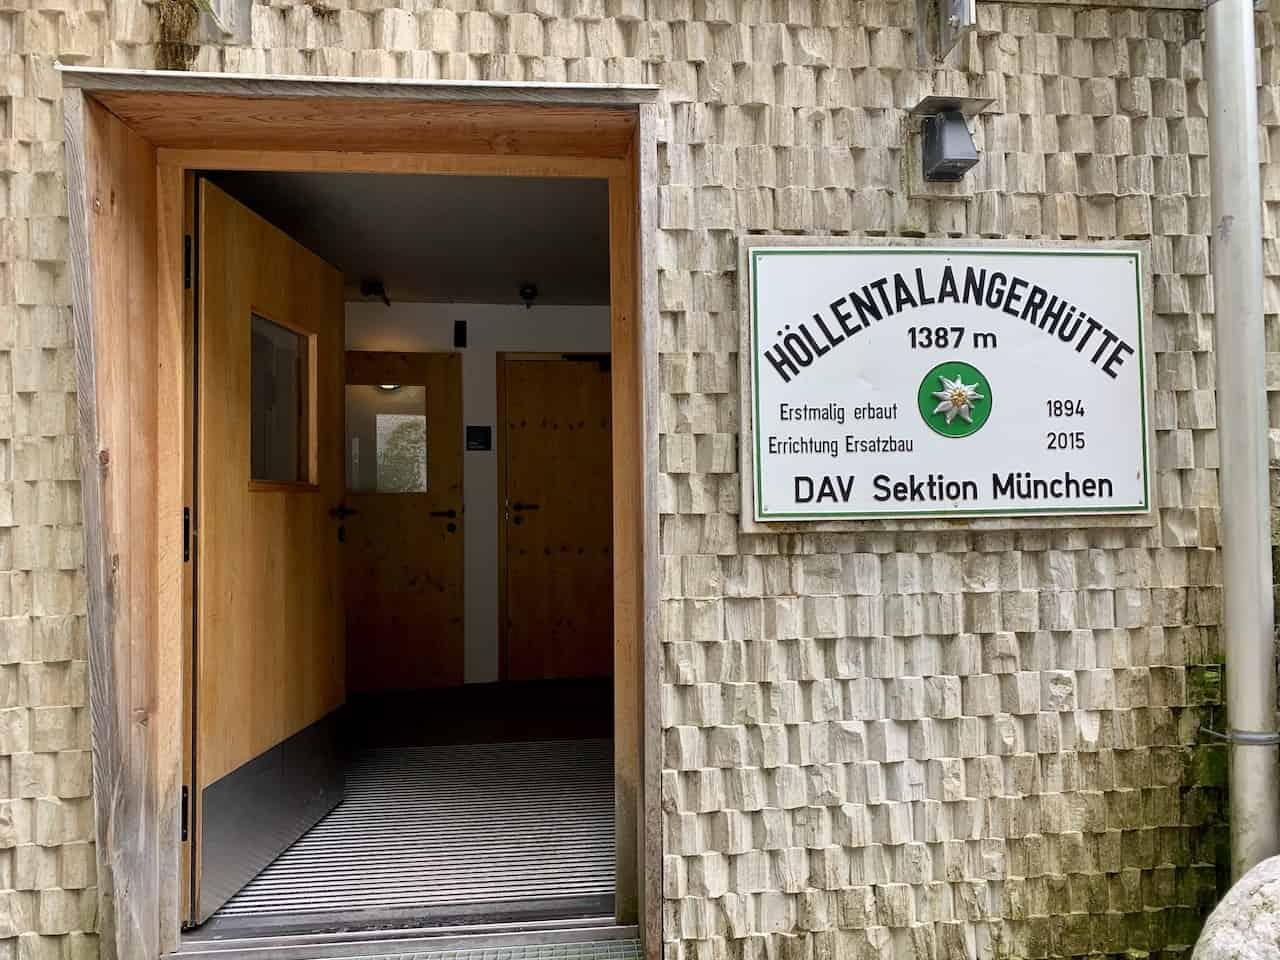 Höllentalangerhütte Entrance